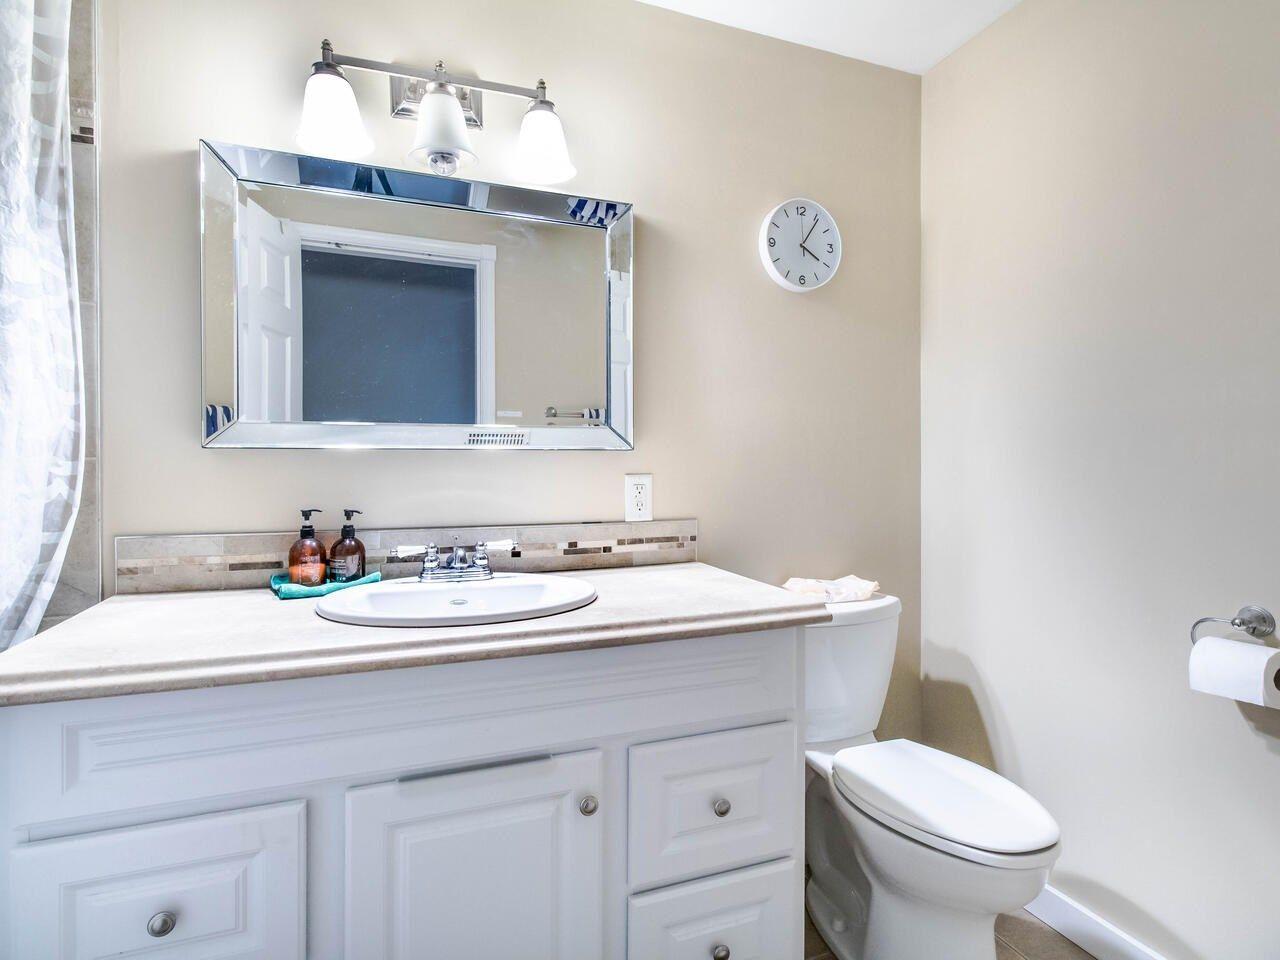 Photo 17: Photos: 11505 PEMBERTON Crescent in Delta: Annieville House for sale (N. Delta)  : MLS®# R2512135